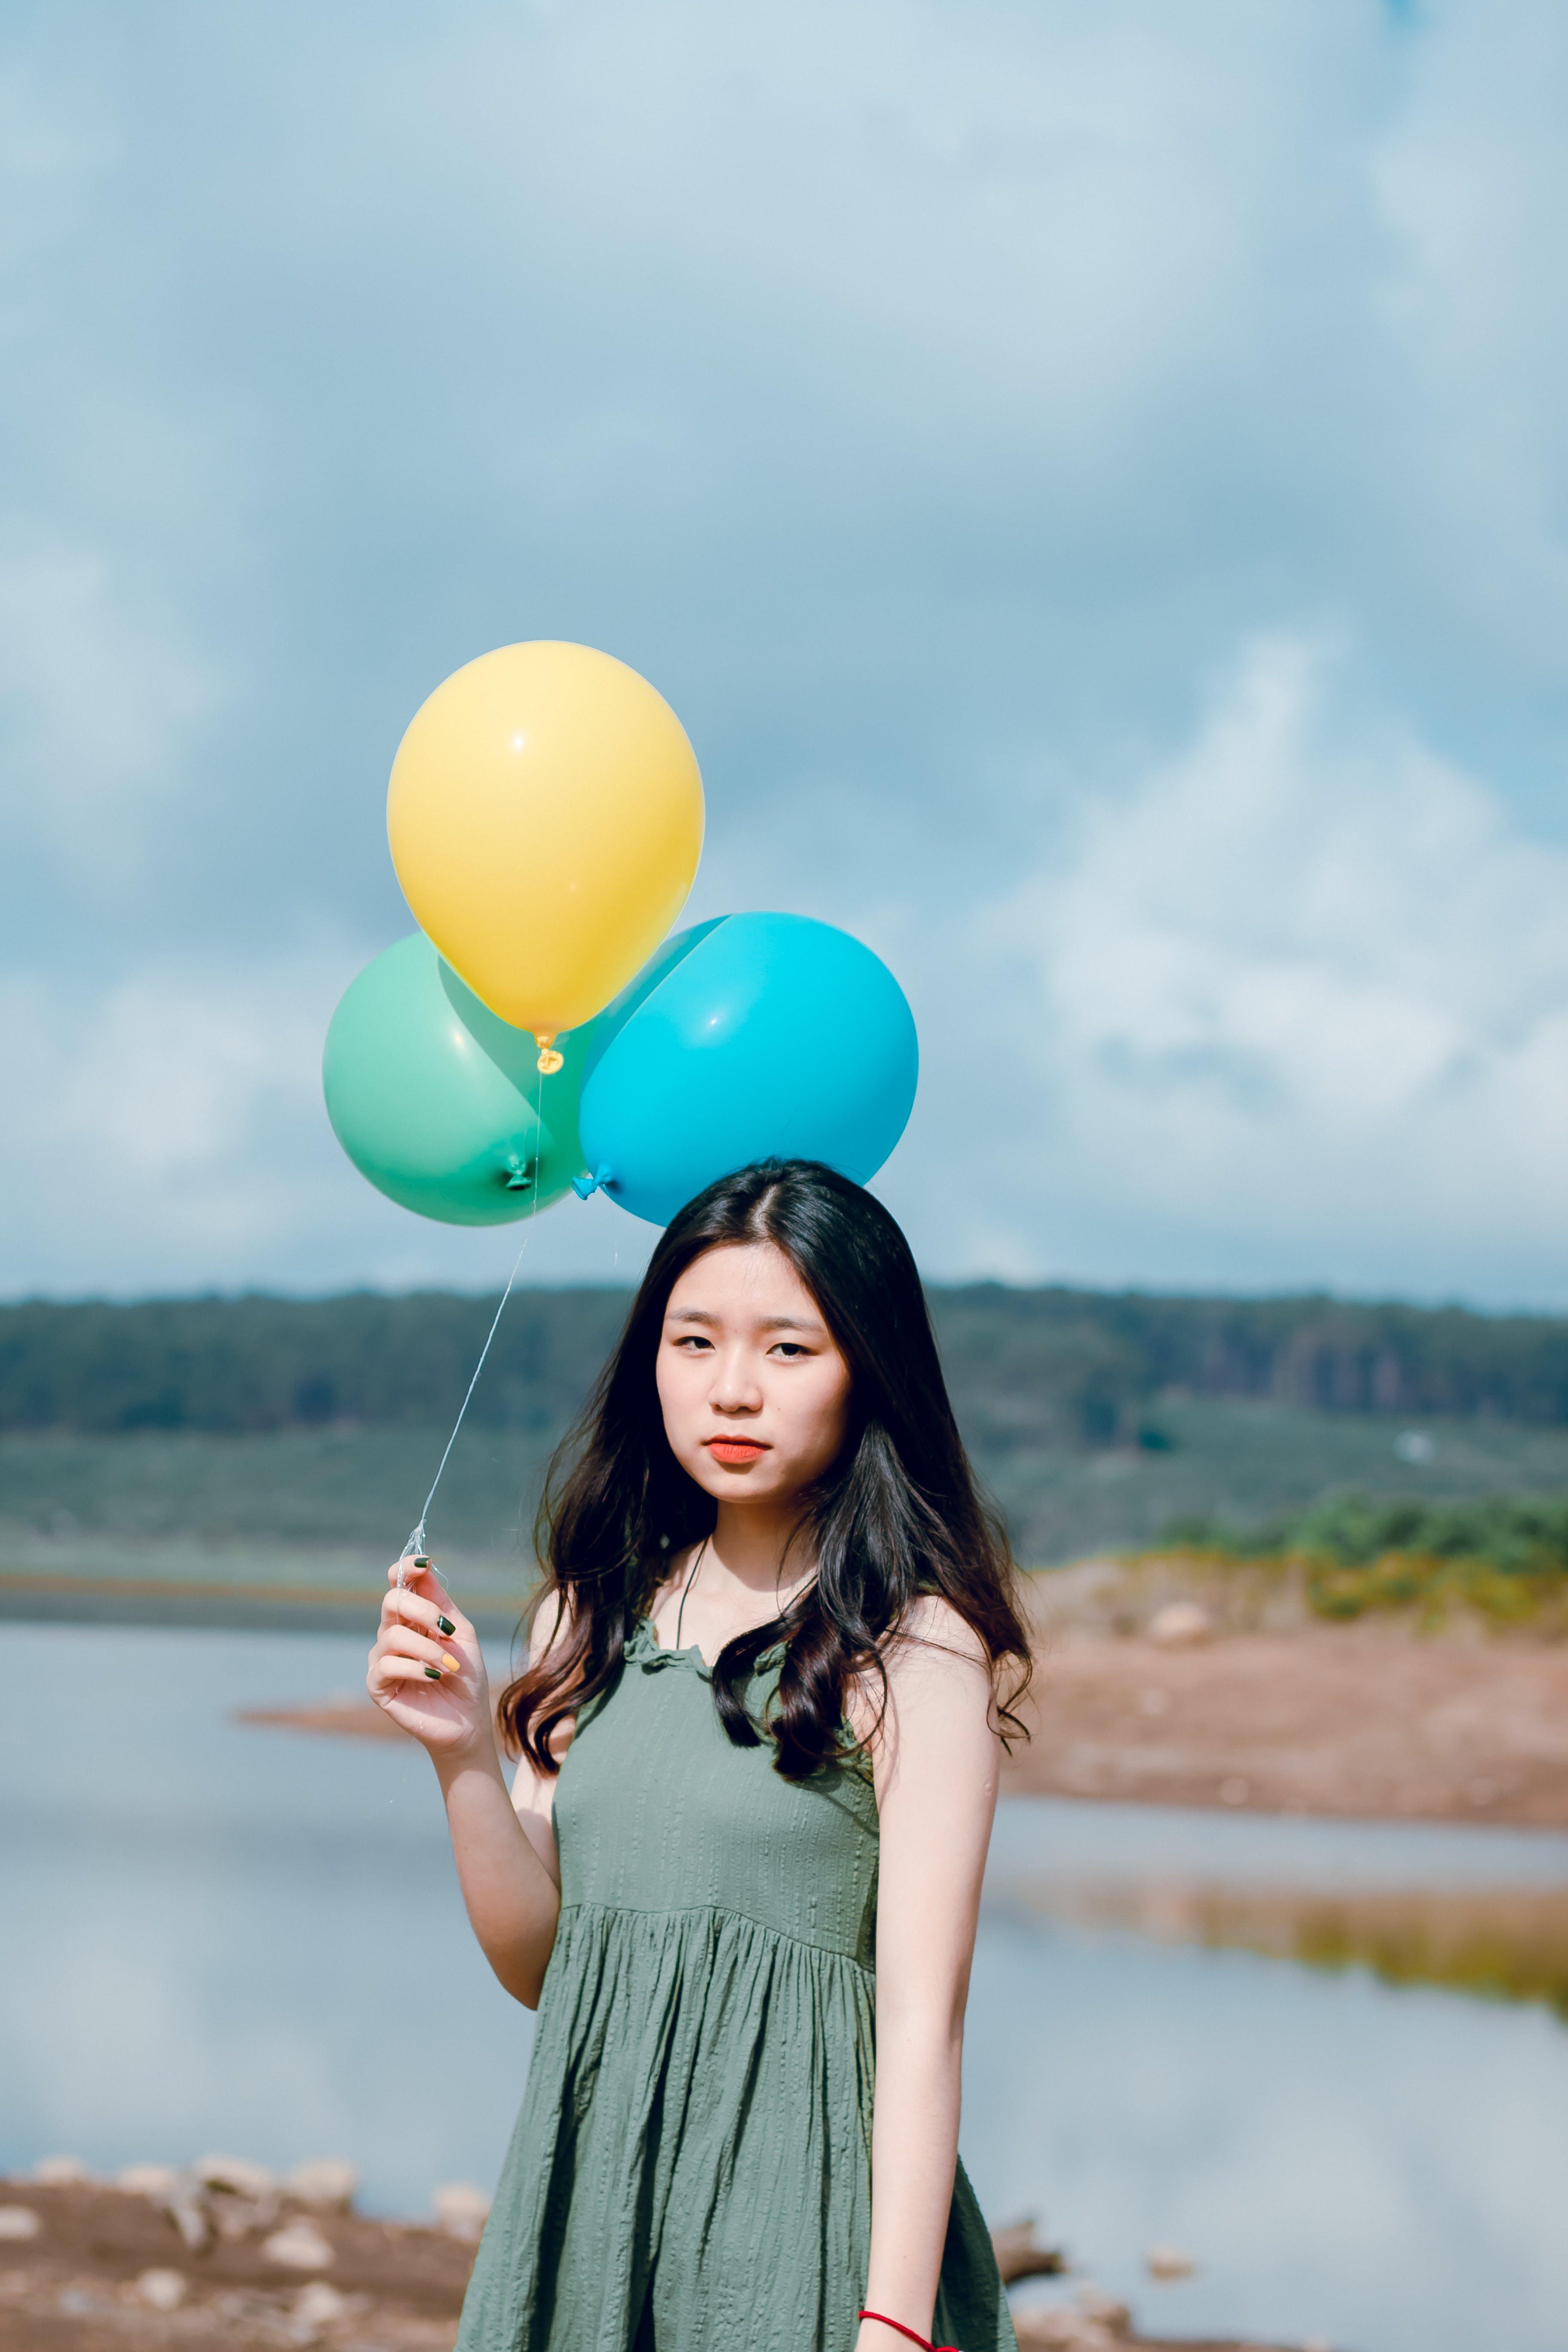 Woman Wearing Dress Holding Balloons